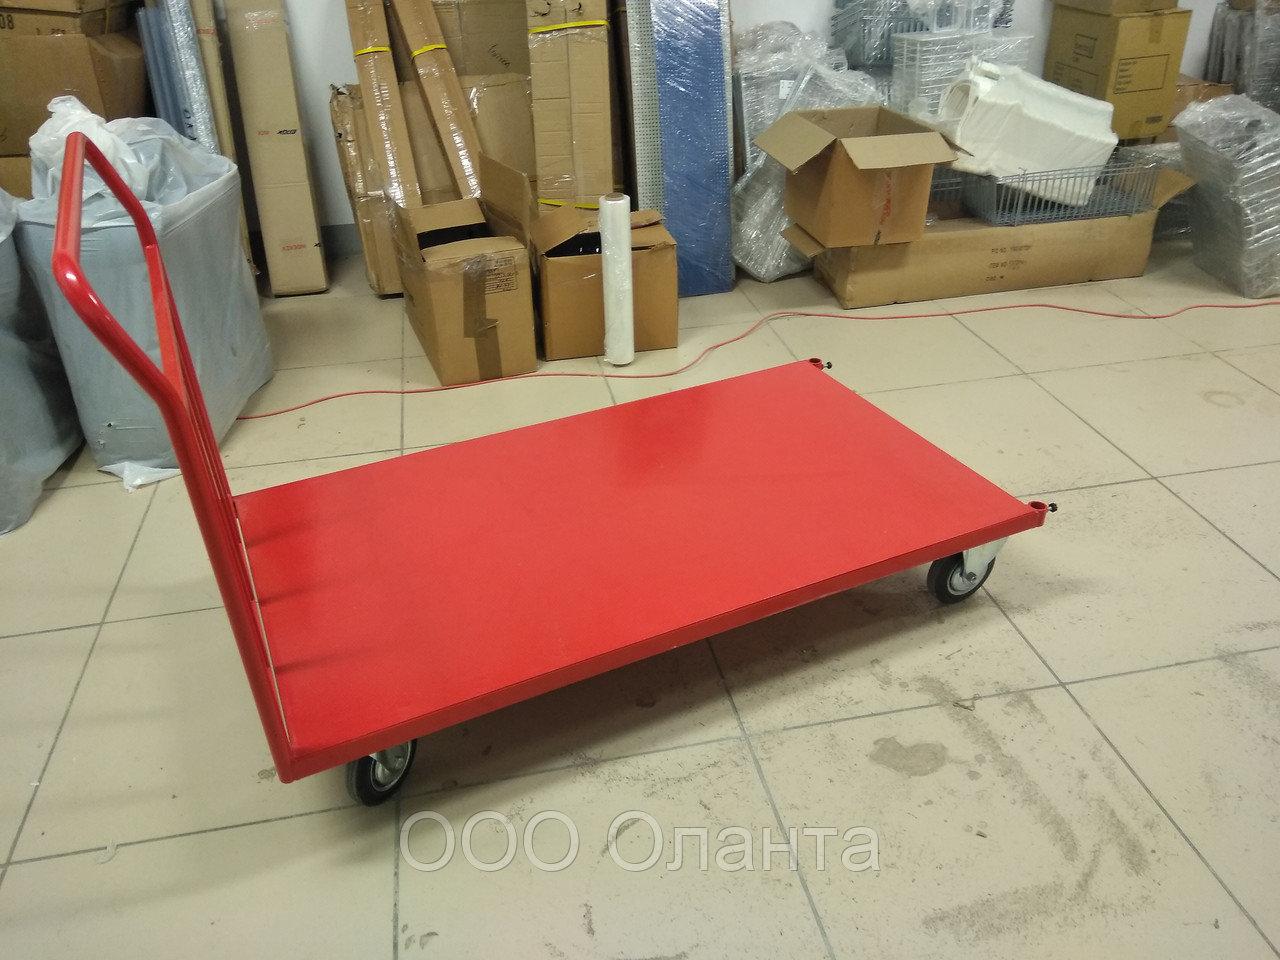 Тележка грузовая платформенная (1400х800 мм) до 450 кг арт. ТГПС14.80